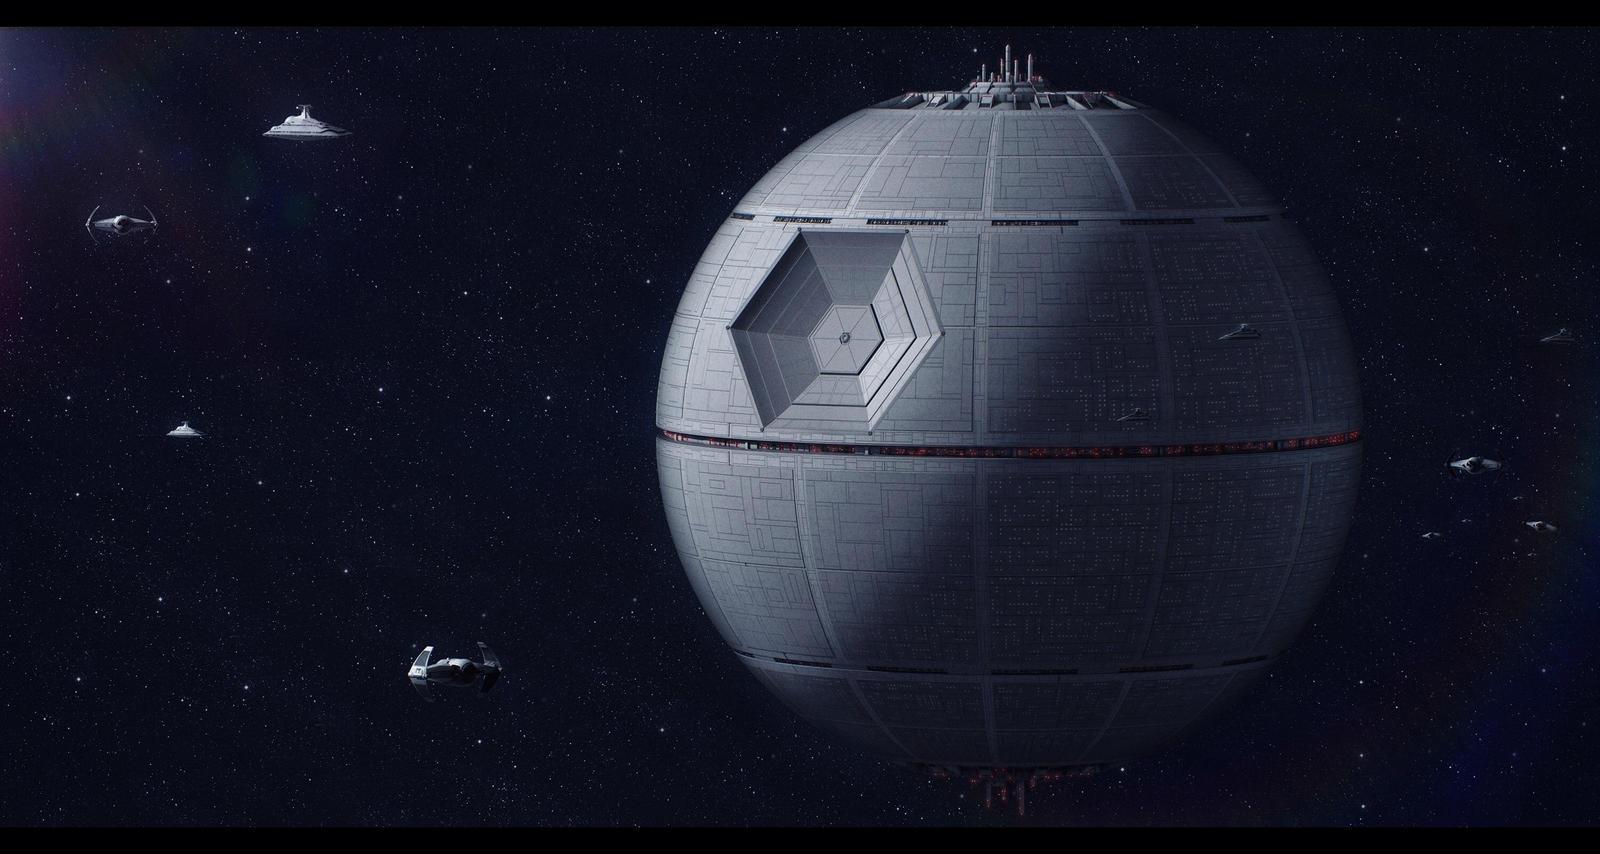 The Ultimate Weapon (Tarkin's Death Star)